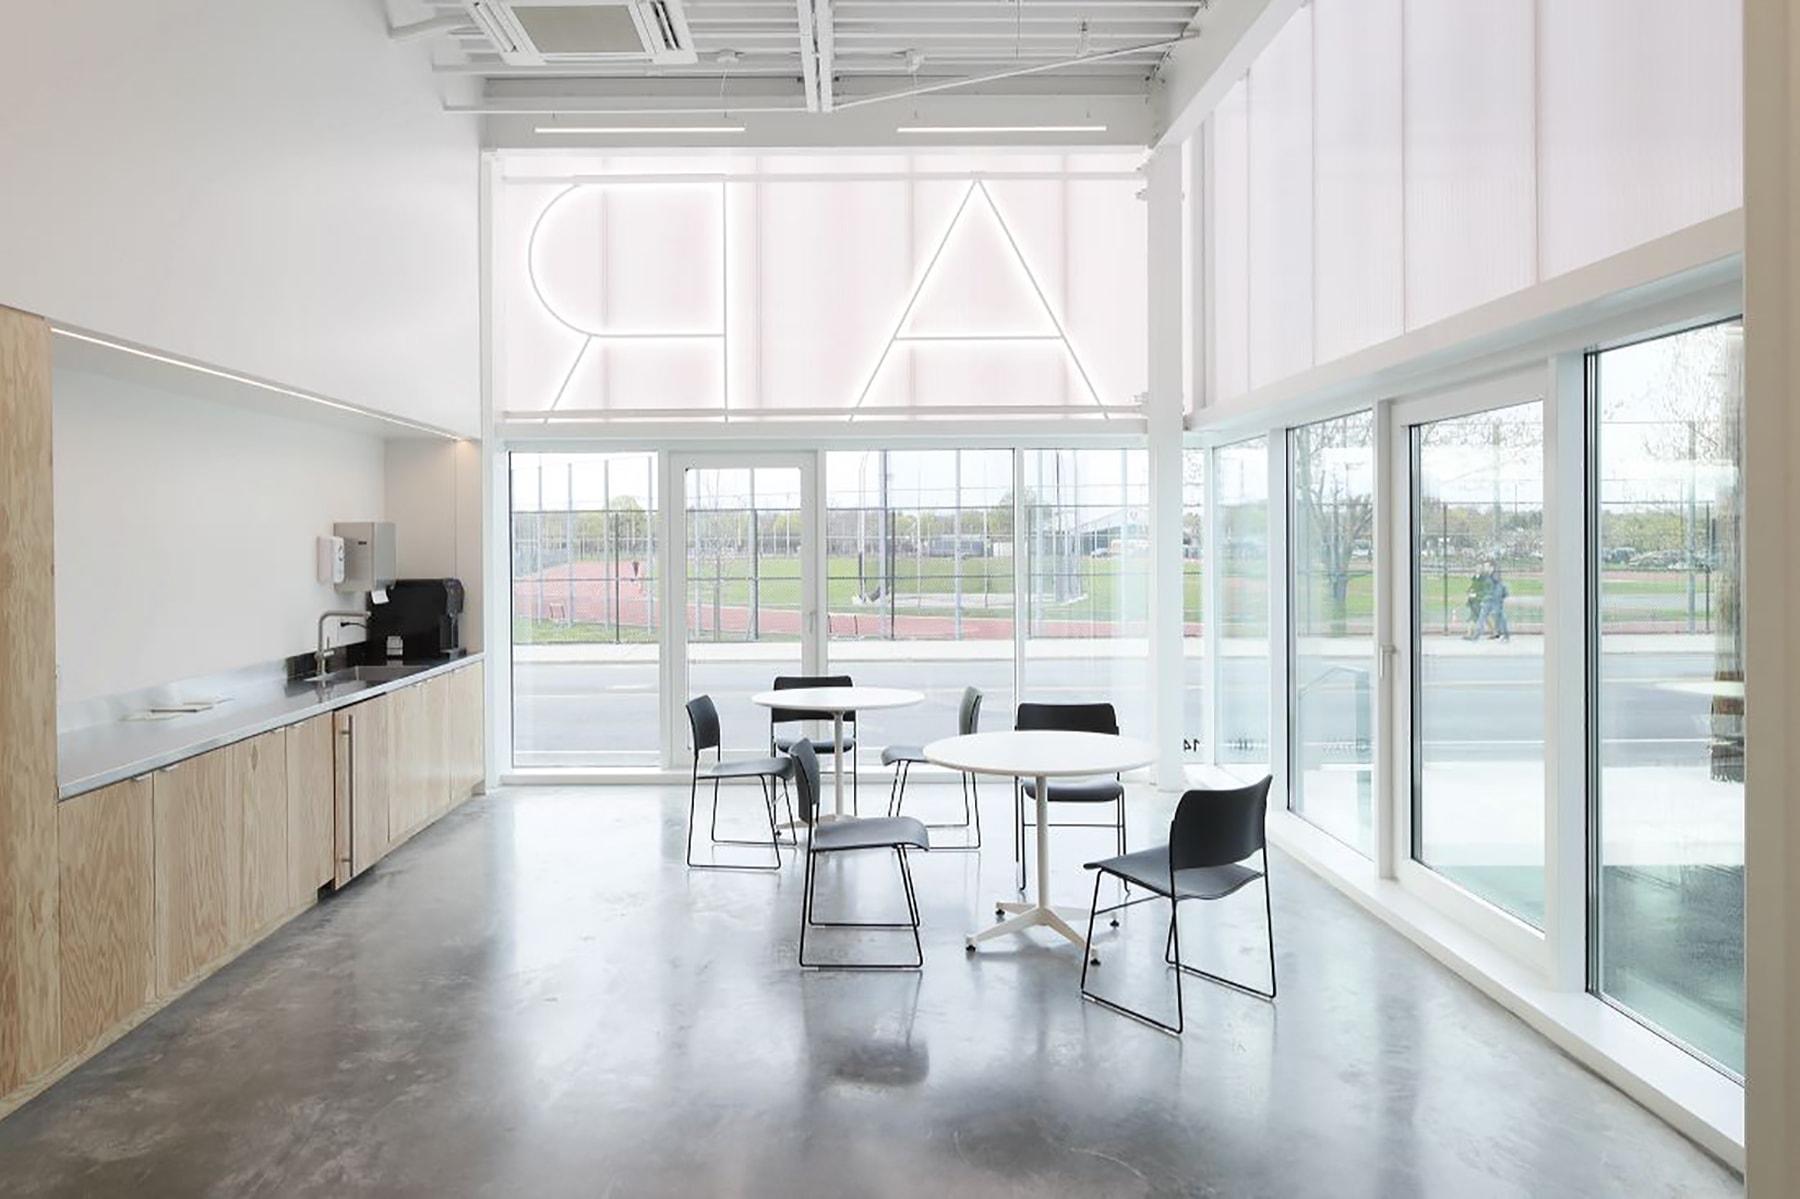 9_ArtLab_Barkow-Lebinger-Architects